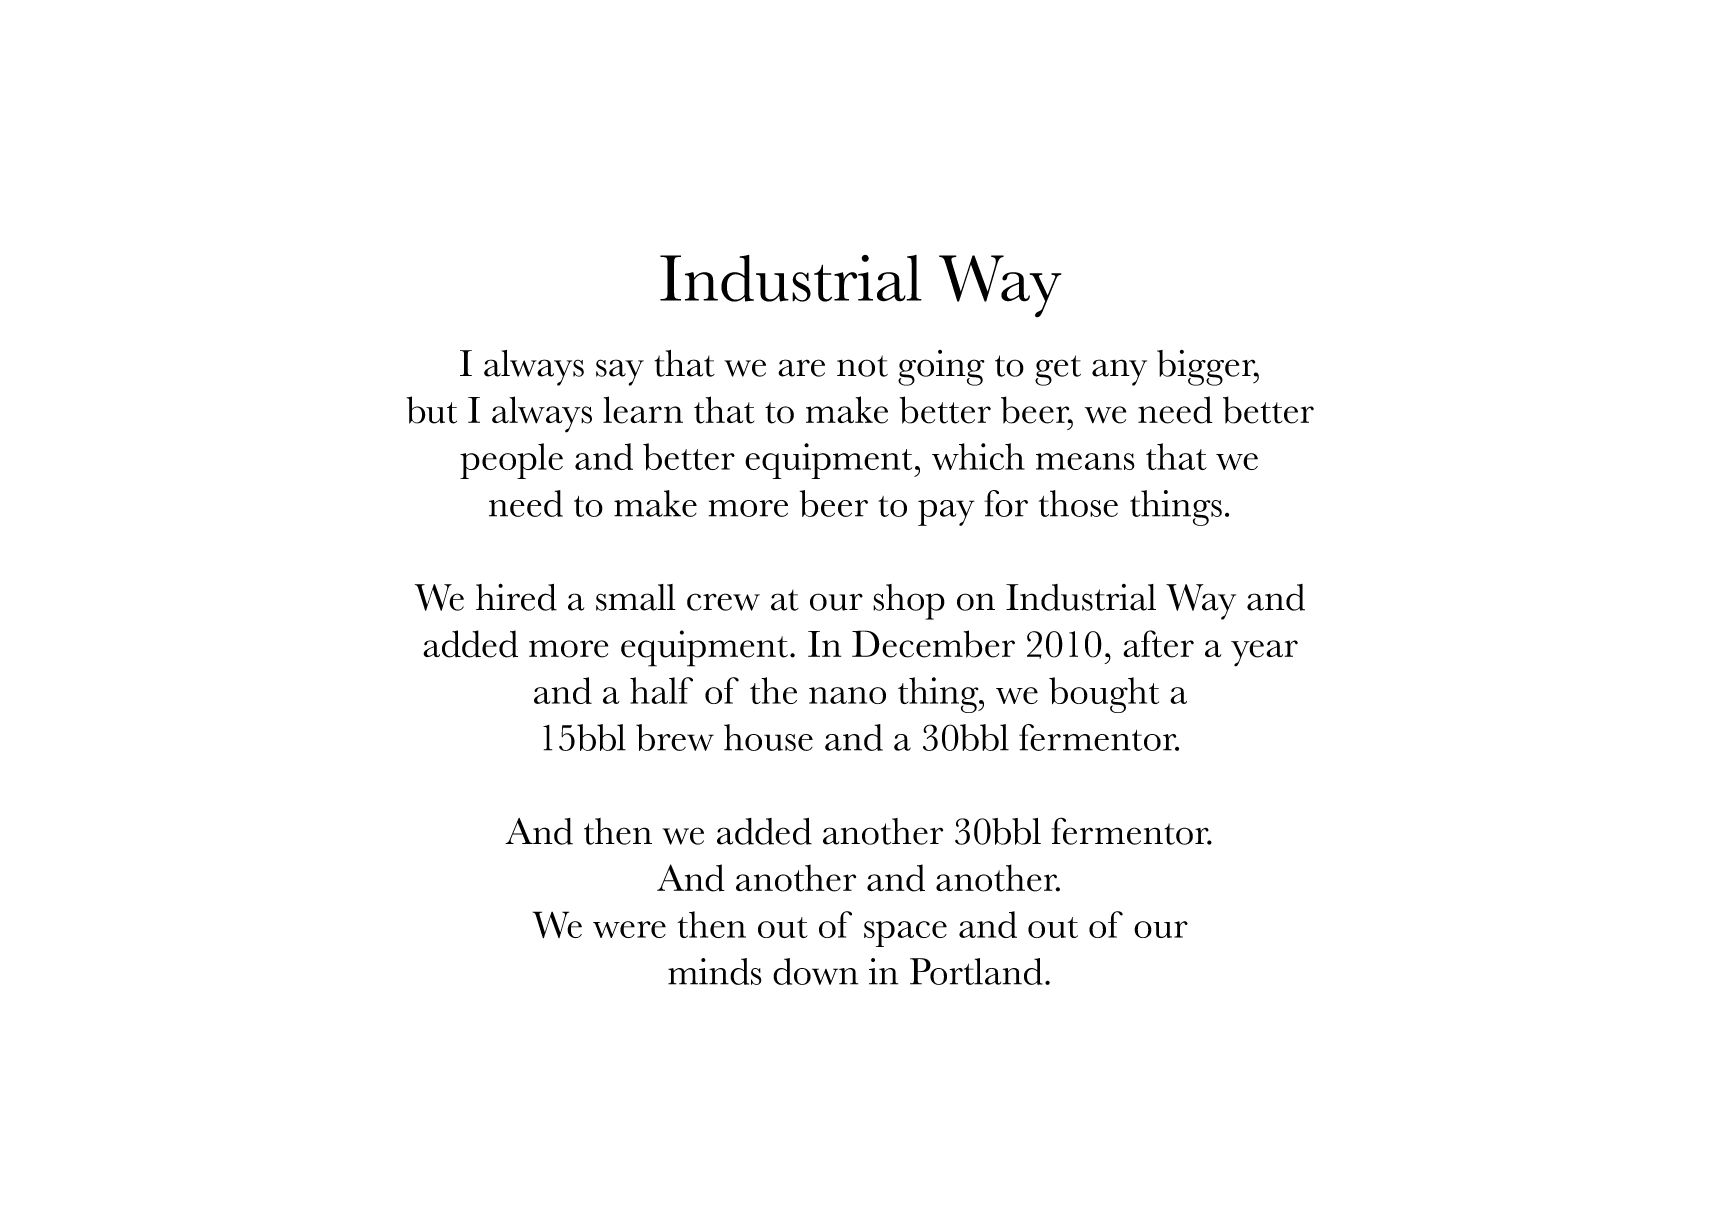 10.IndustrialWay.jpg